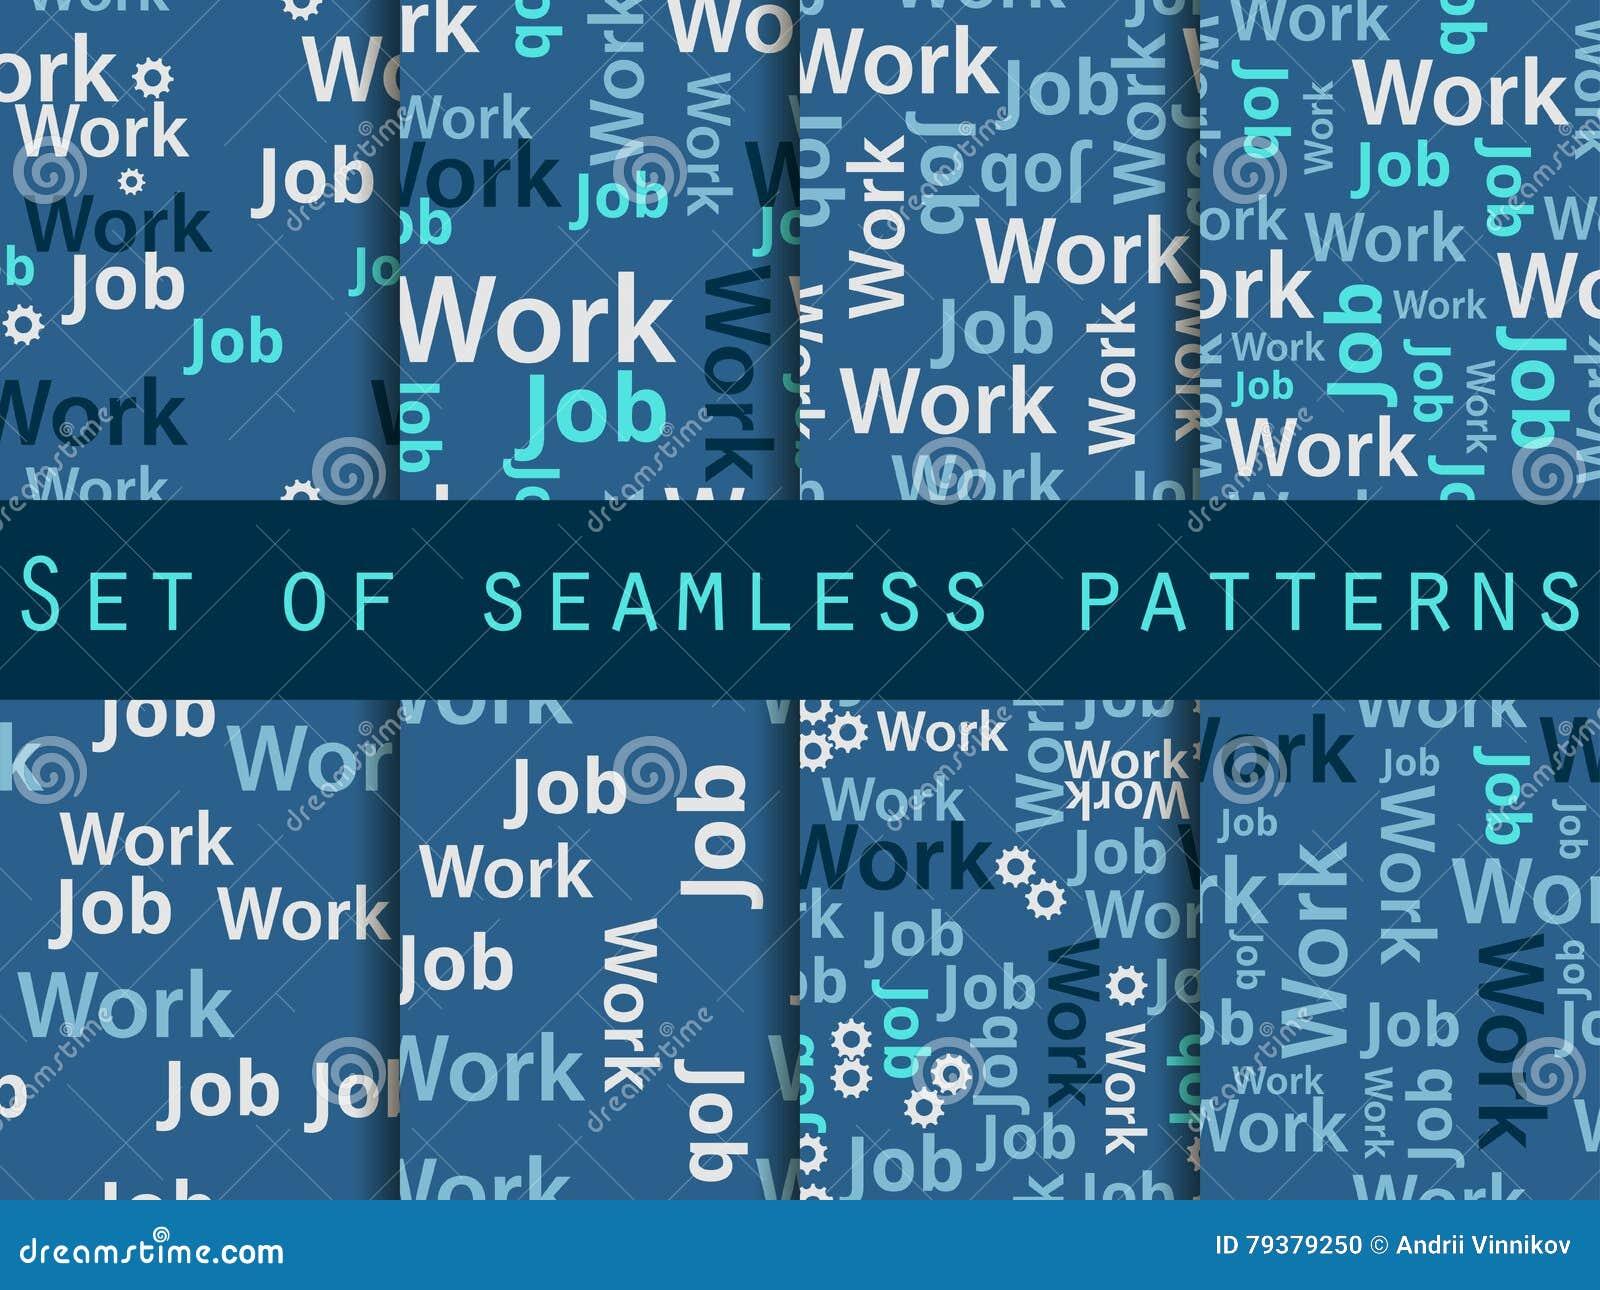 Pattern Words Amazing Inspiration Ideas